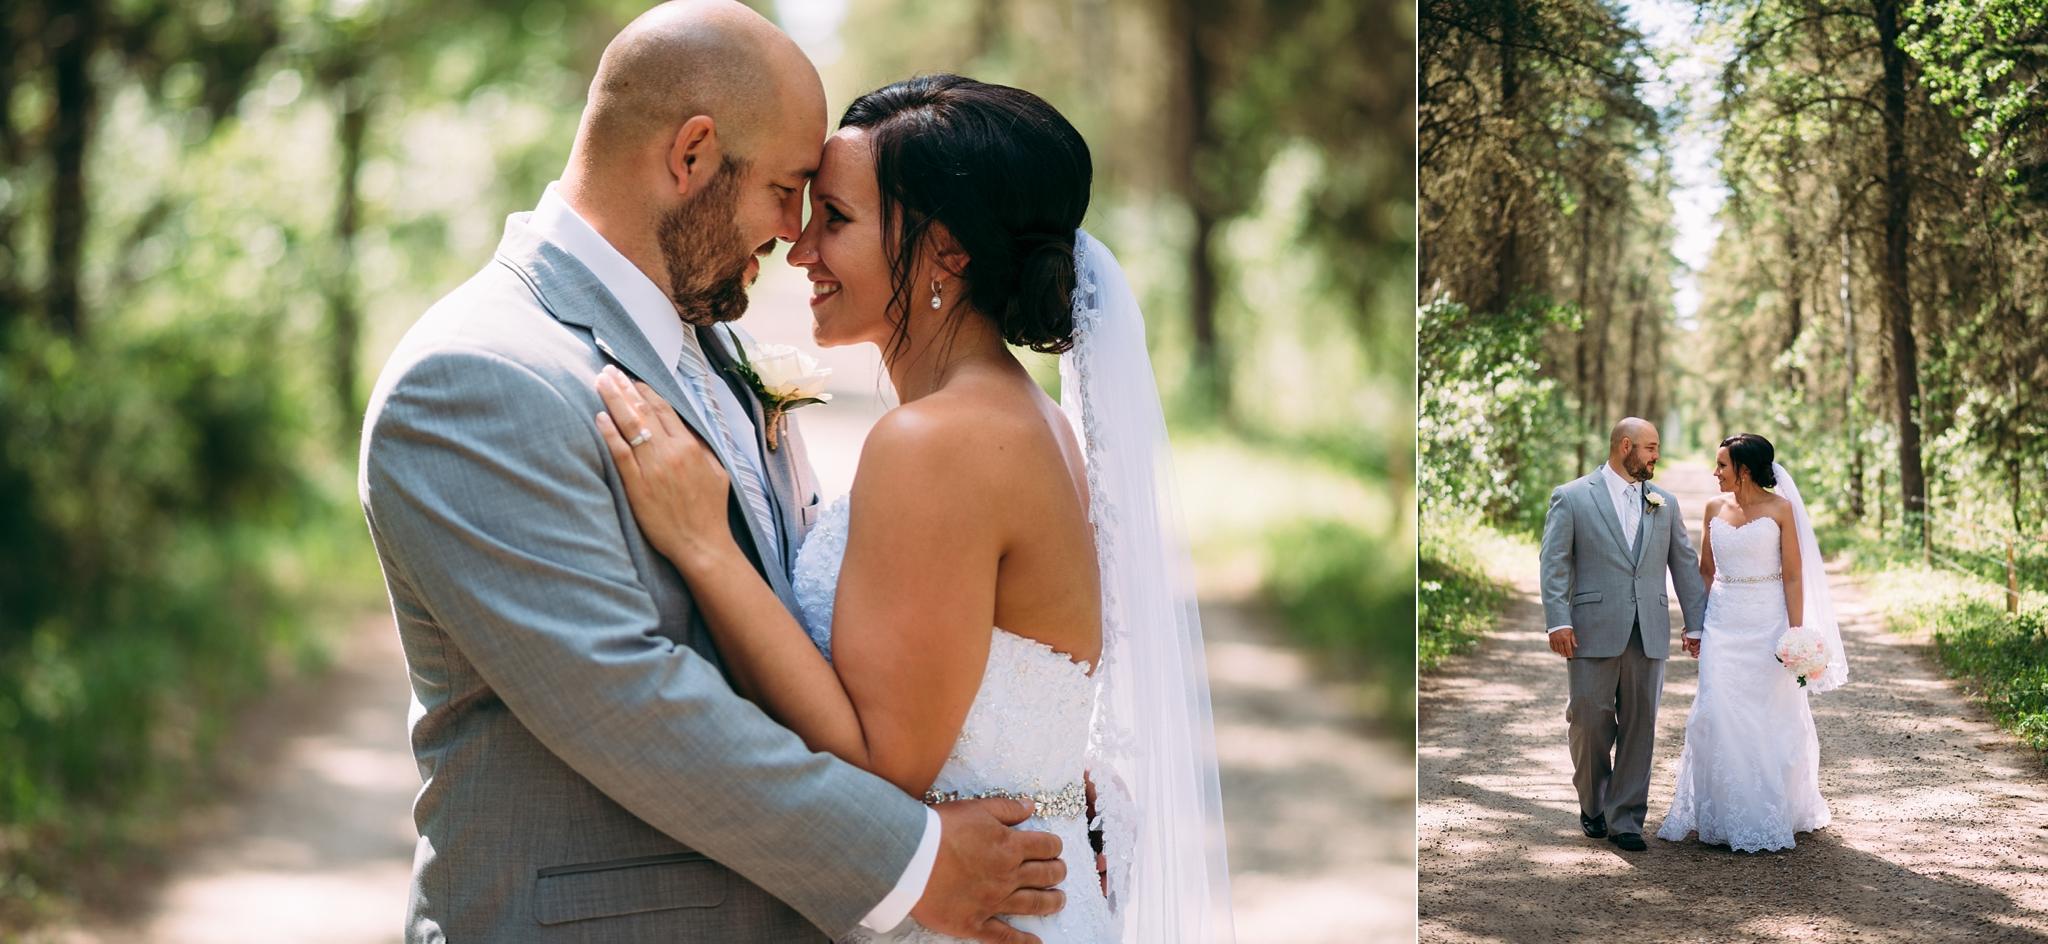 kaihla_tonai_intimate_wedding_elopement_photographer_1540